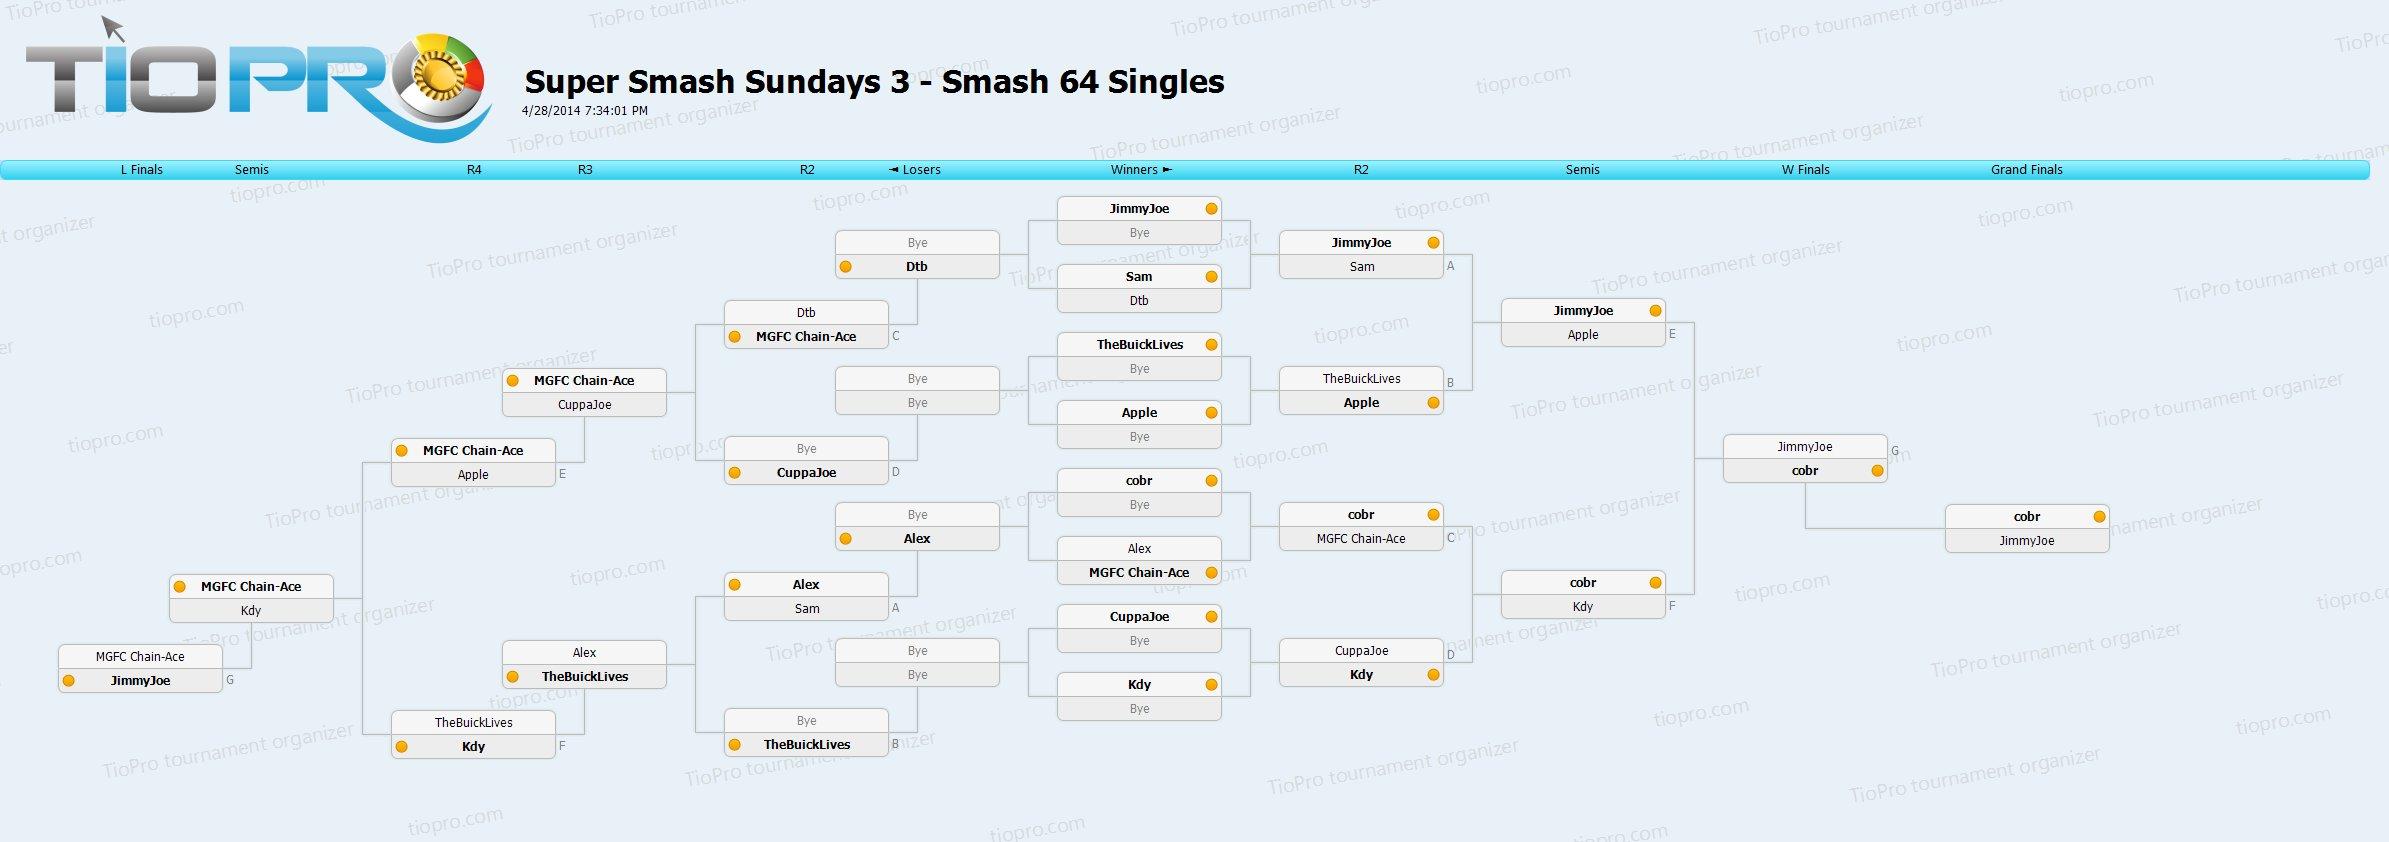 Super Smash Sundays East Coast # 3 - 64 Singles